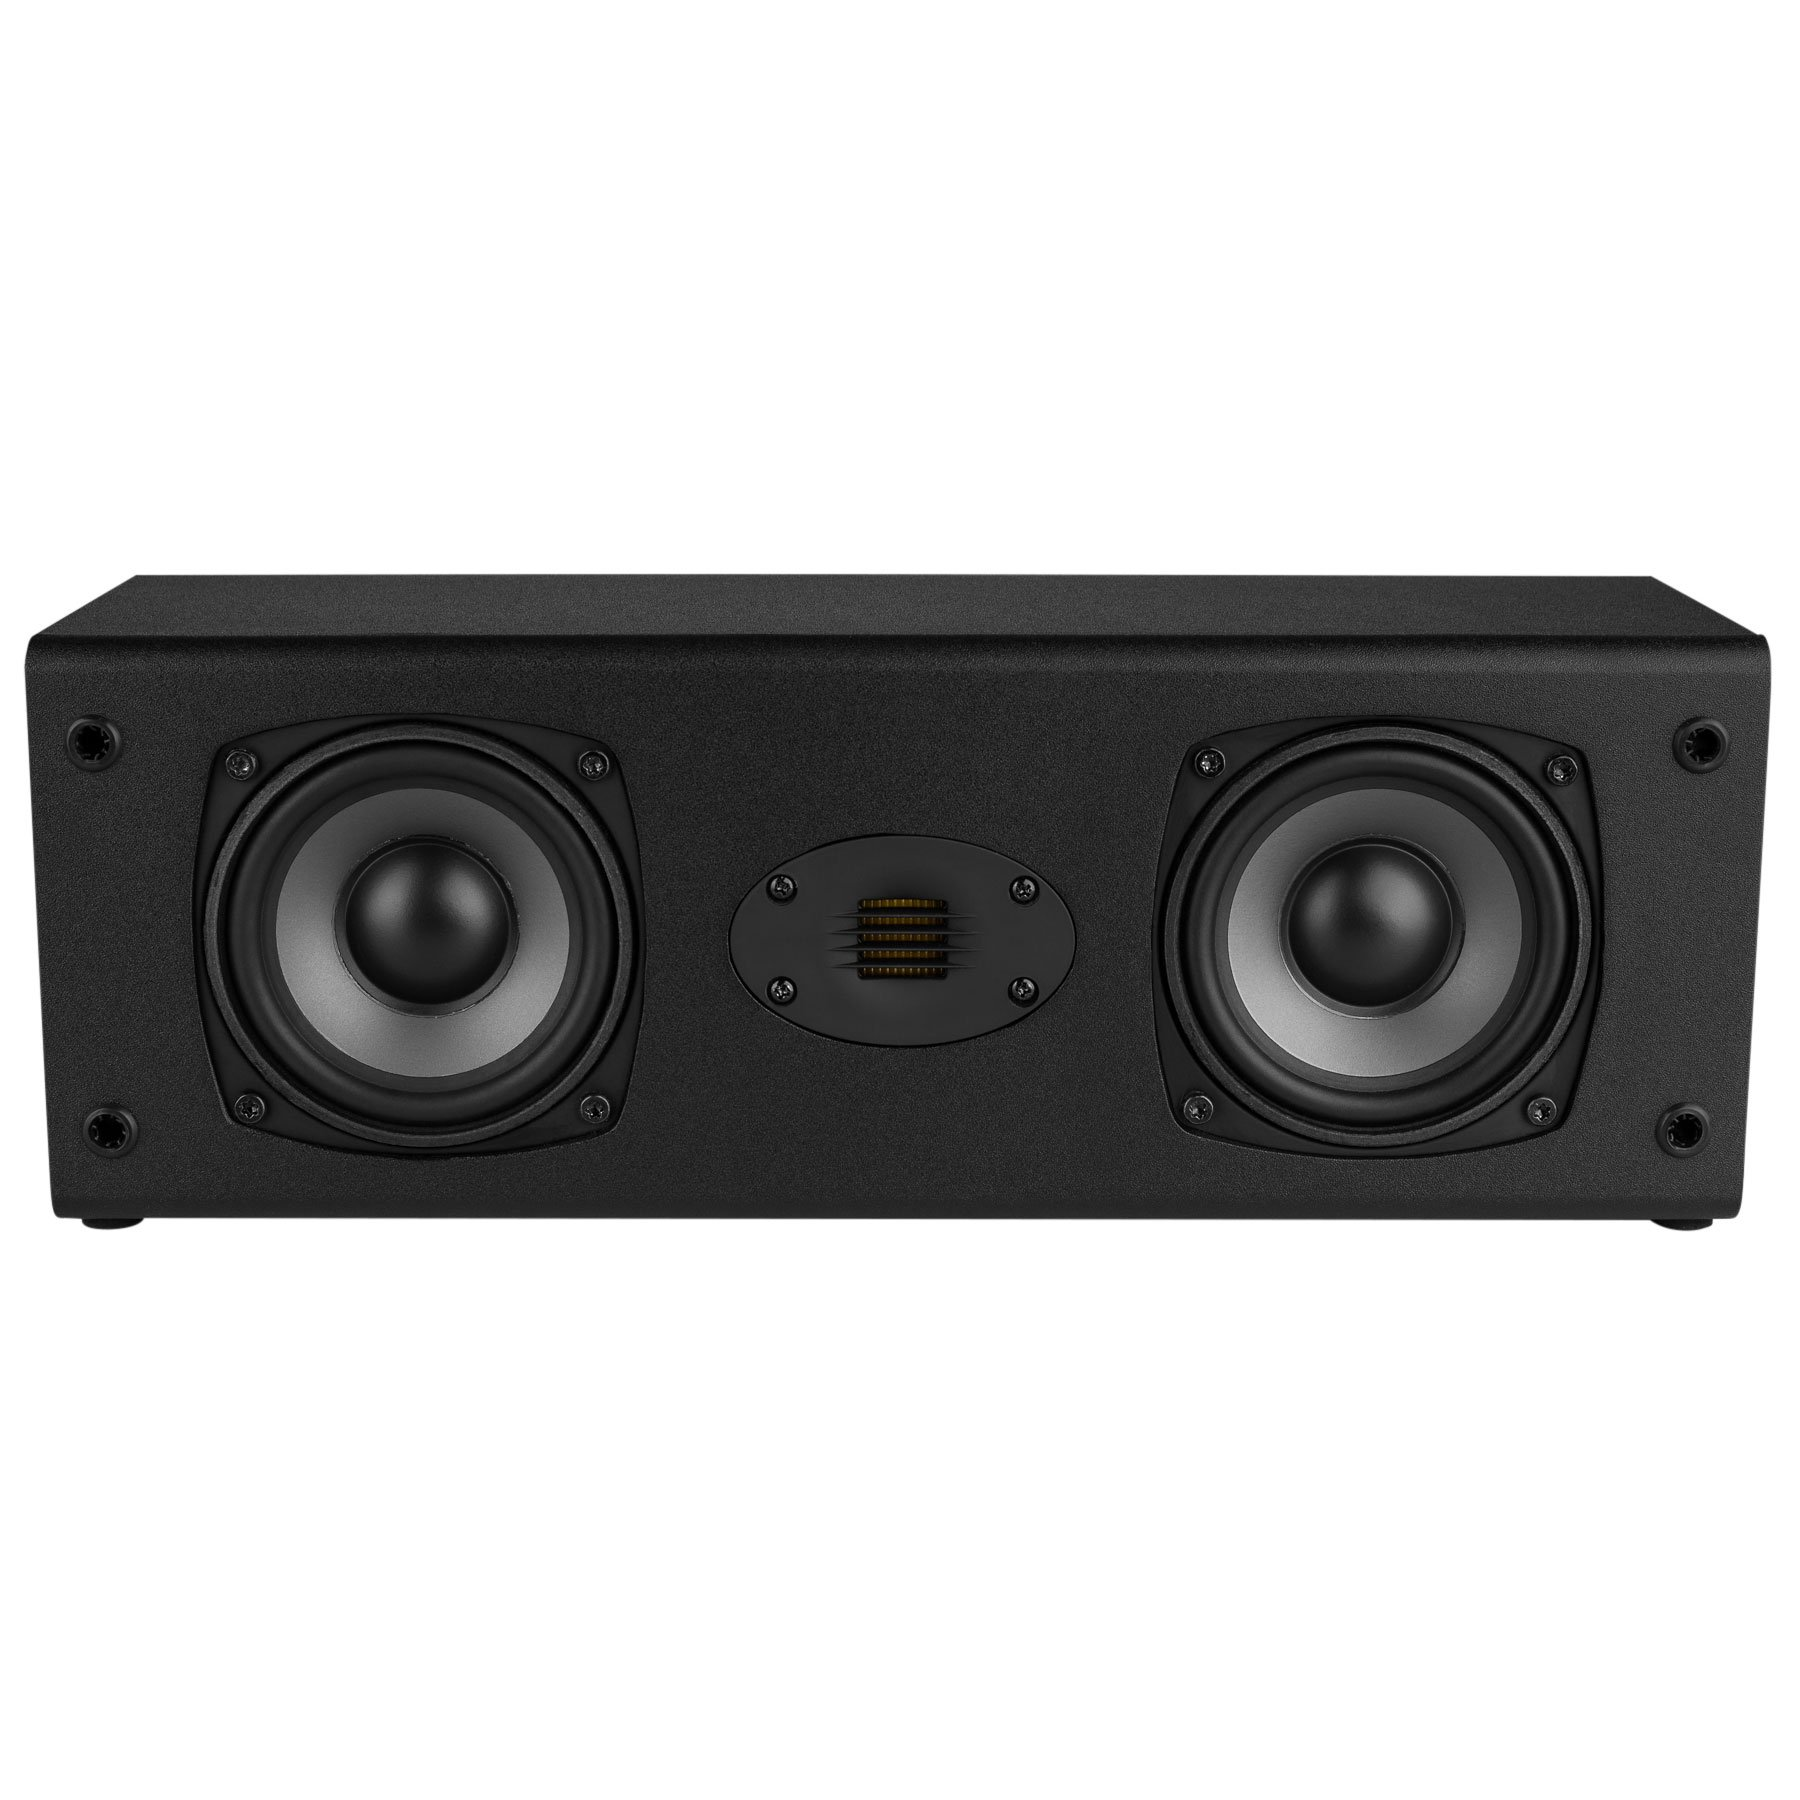 Dayton Audio C452-AIR Dual 4-1/2'' 2-Way Center Channel Speaker with AMT Tweeter by Dayton Audio